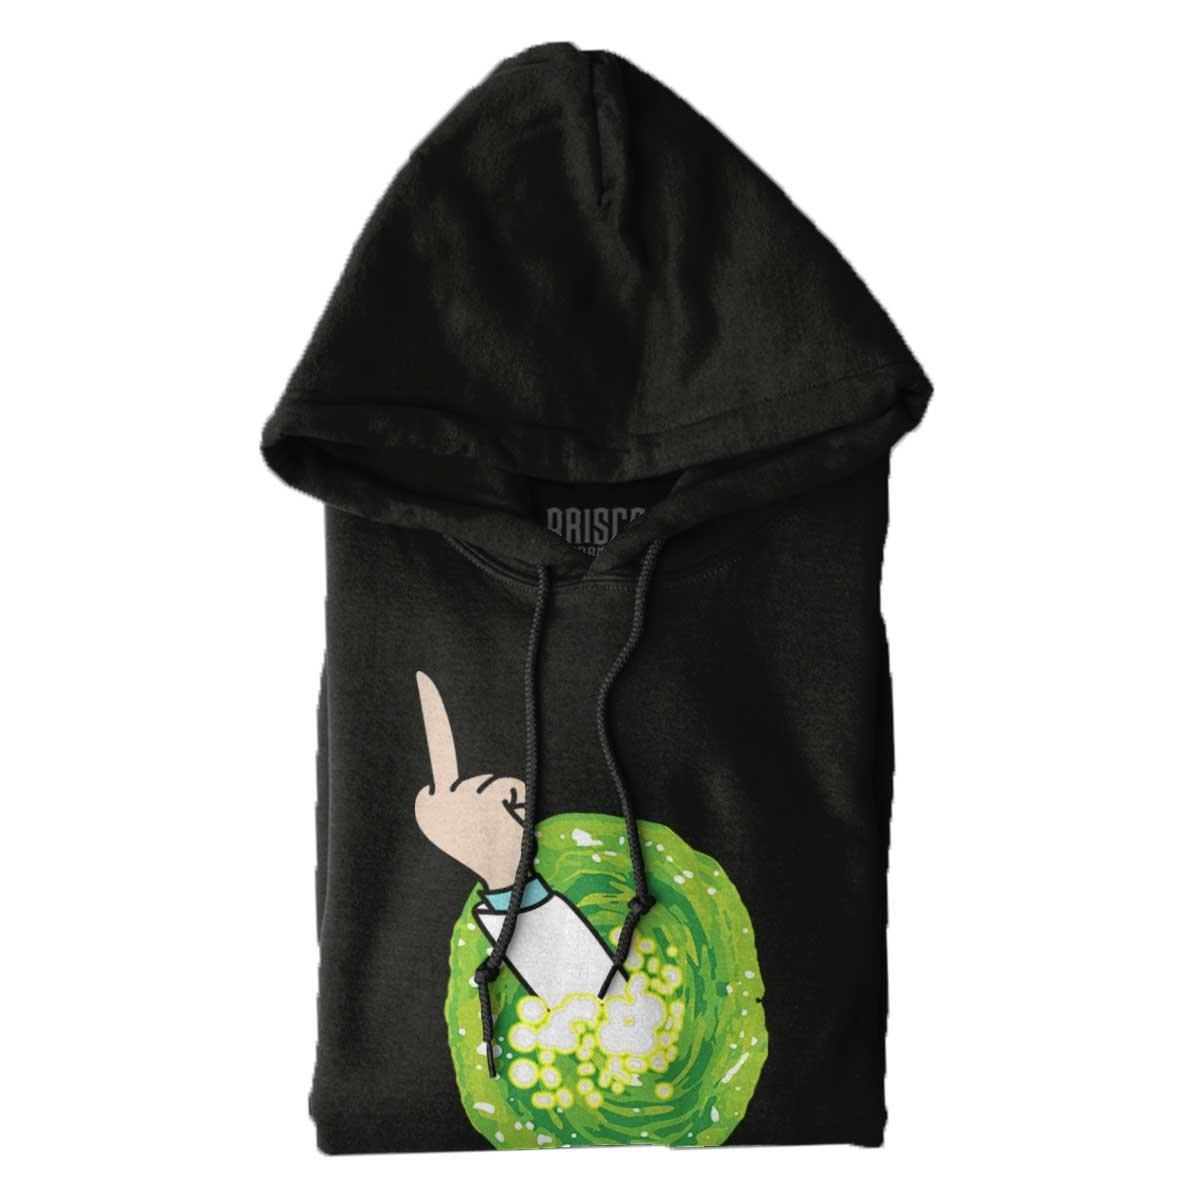 Brisco Brands Portal Rick Sanchez Schwifty Cool Funny Morty GLIP Glop Edgy Hoodie Sweatshirt by Brisco Brands (Image #6)